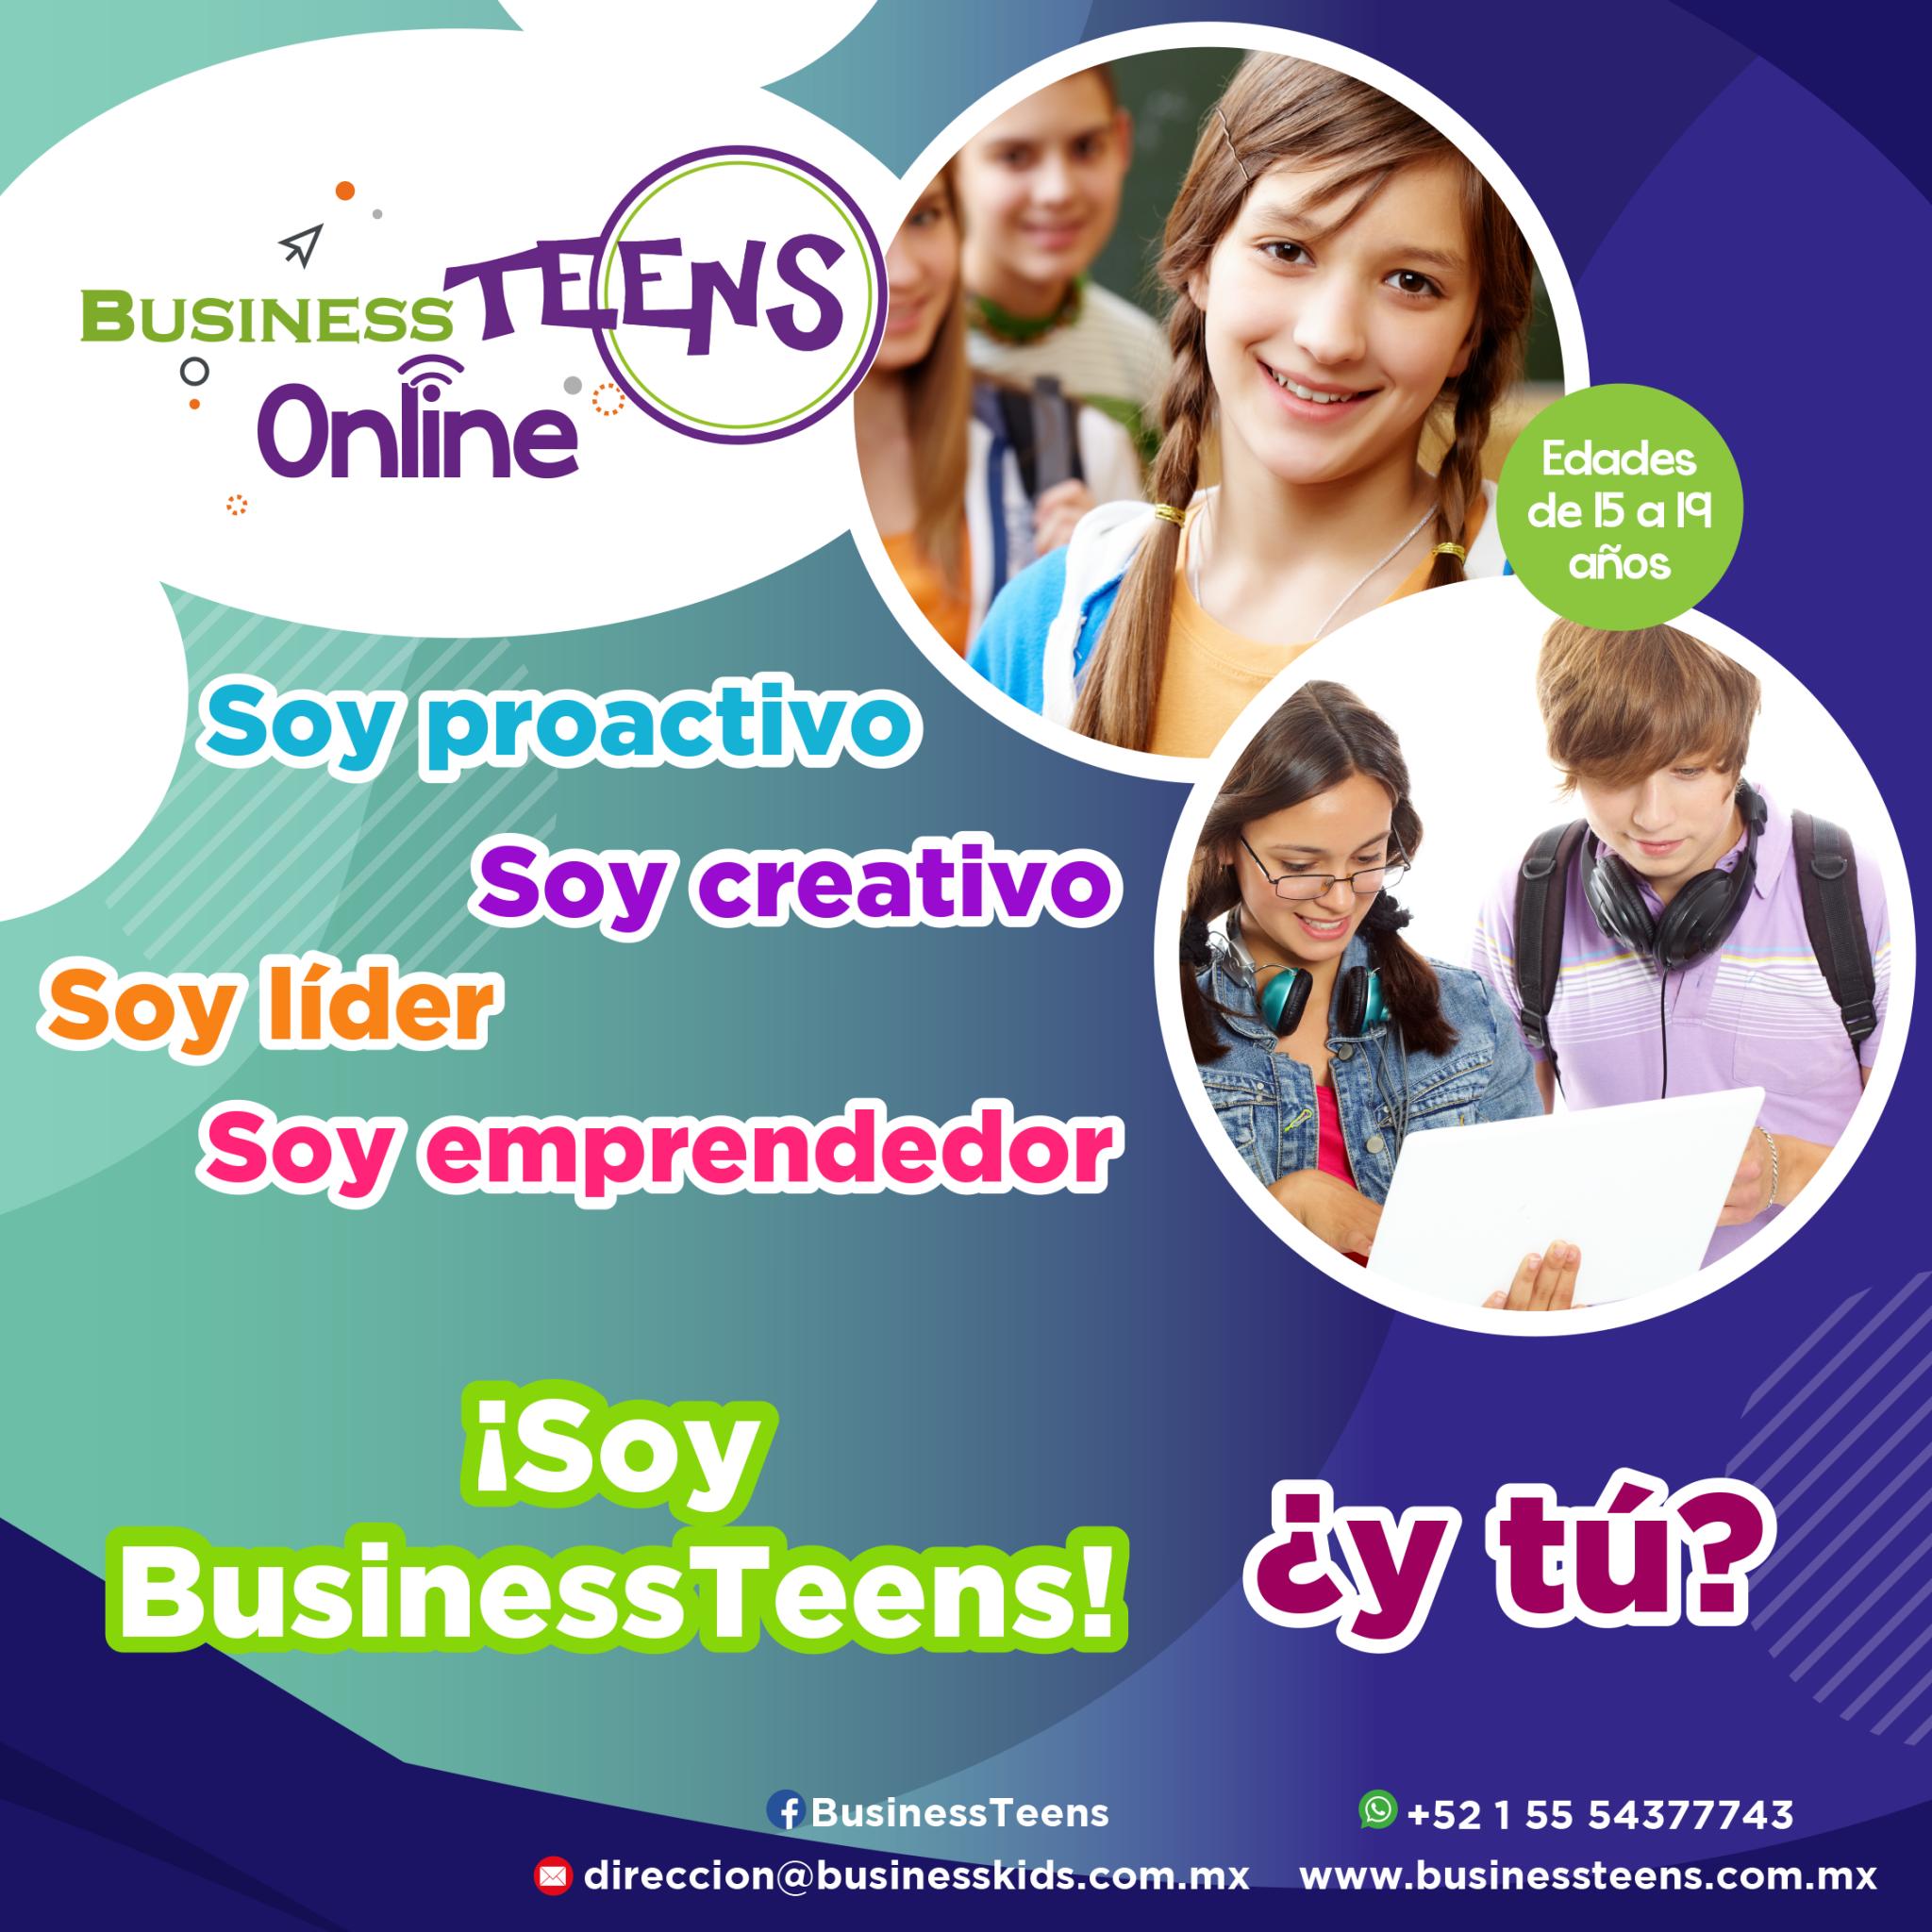 Curso-regaluar-BusinessTeens